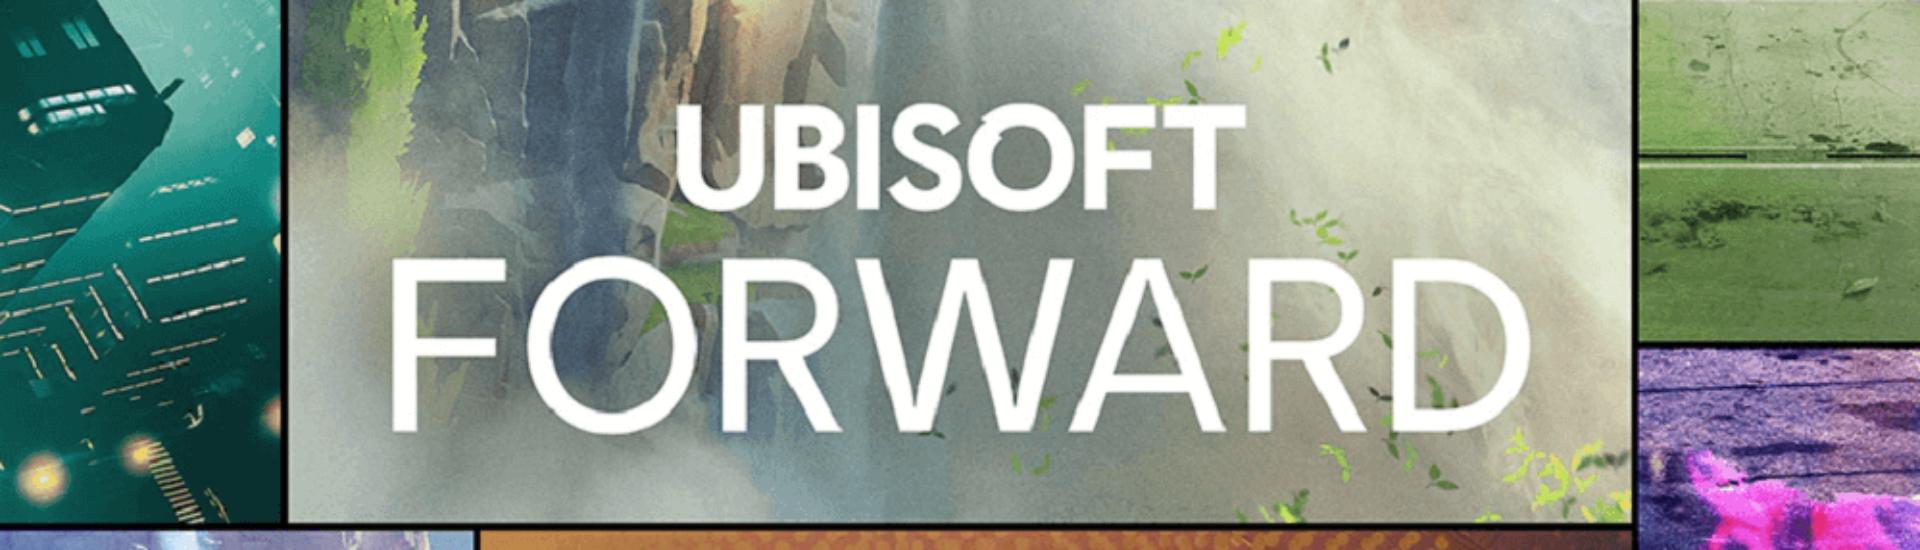 Digitales Event: Ubisoft Forward findet im September statt